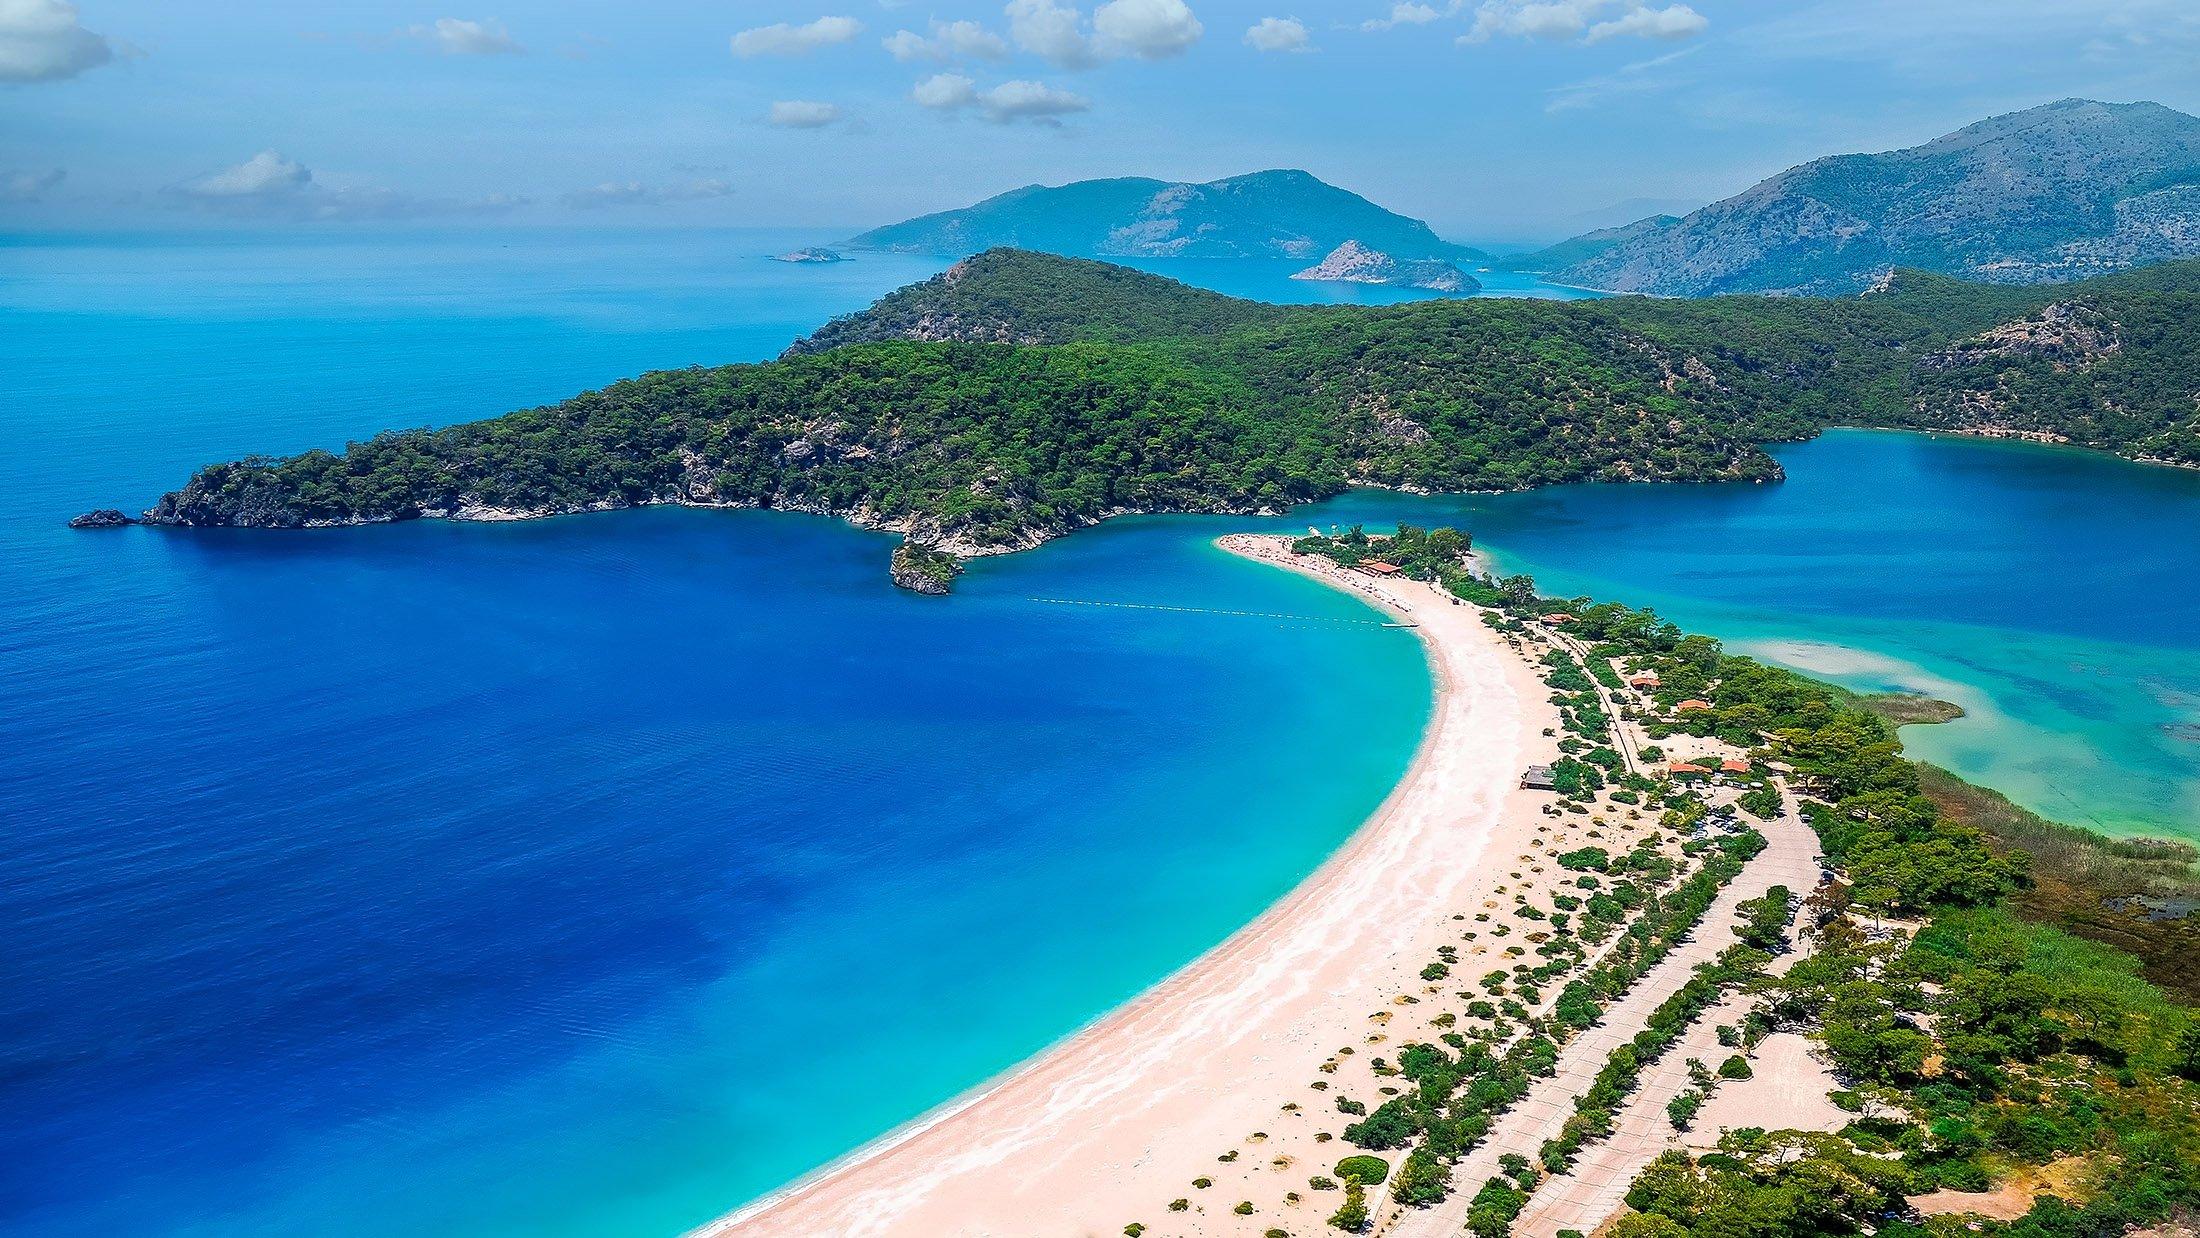 Ölüdeniz is one of the most popular destinations in Turkey. (Shutterstock Photo)